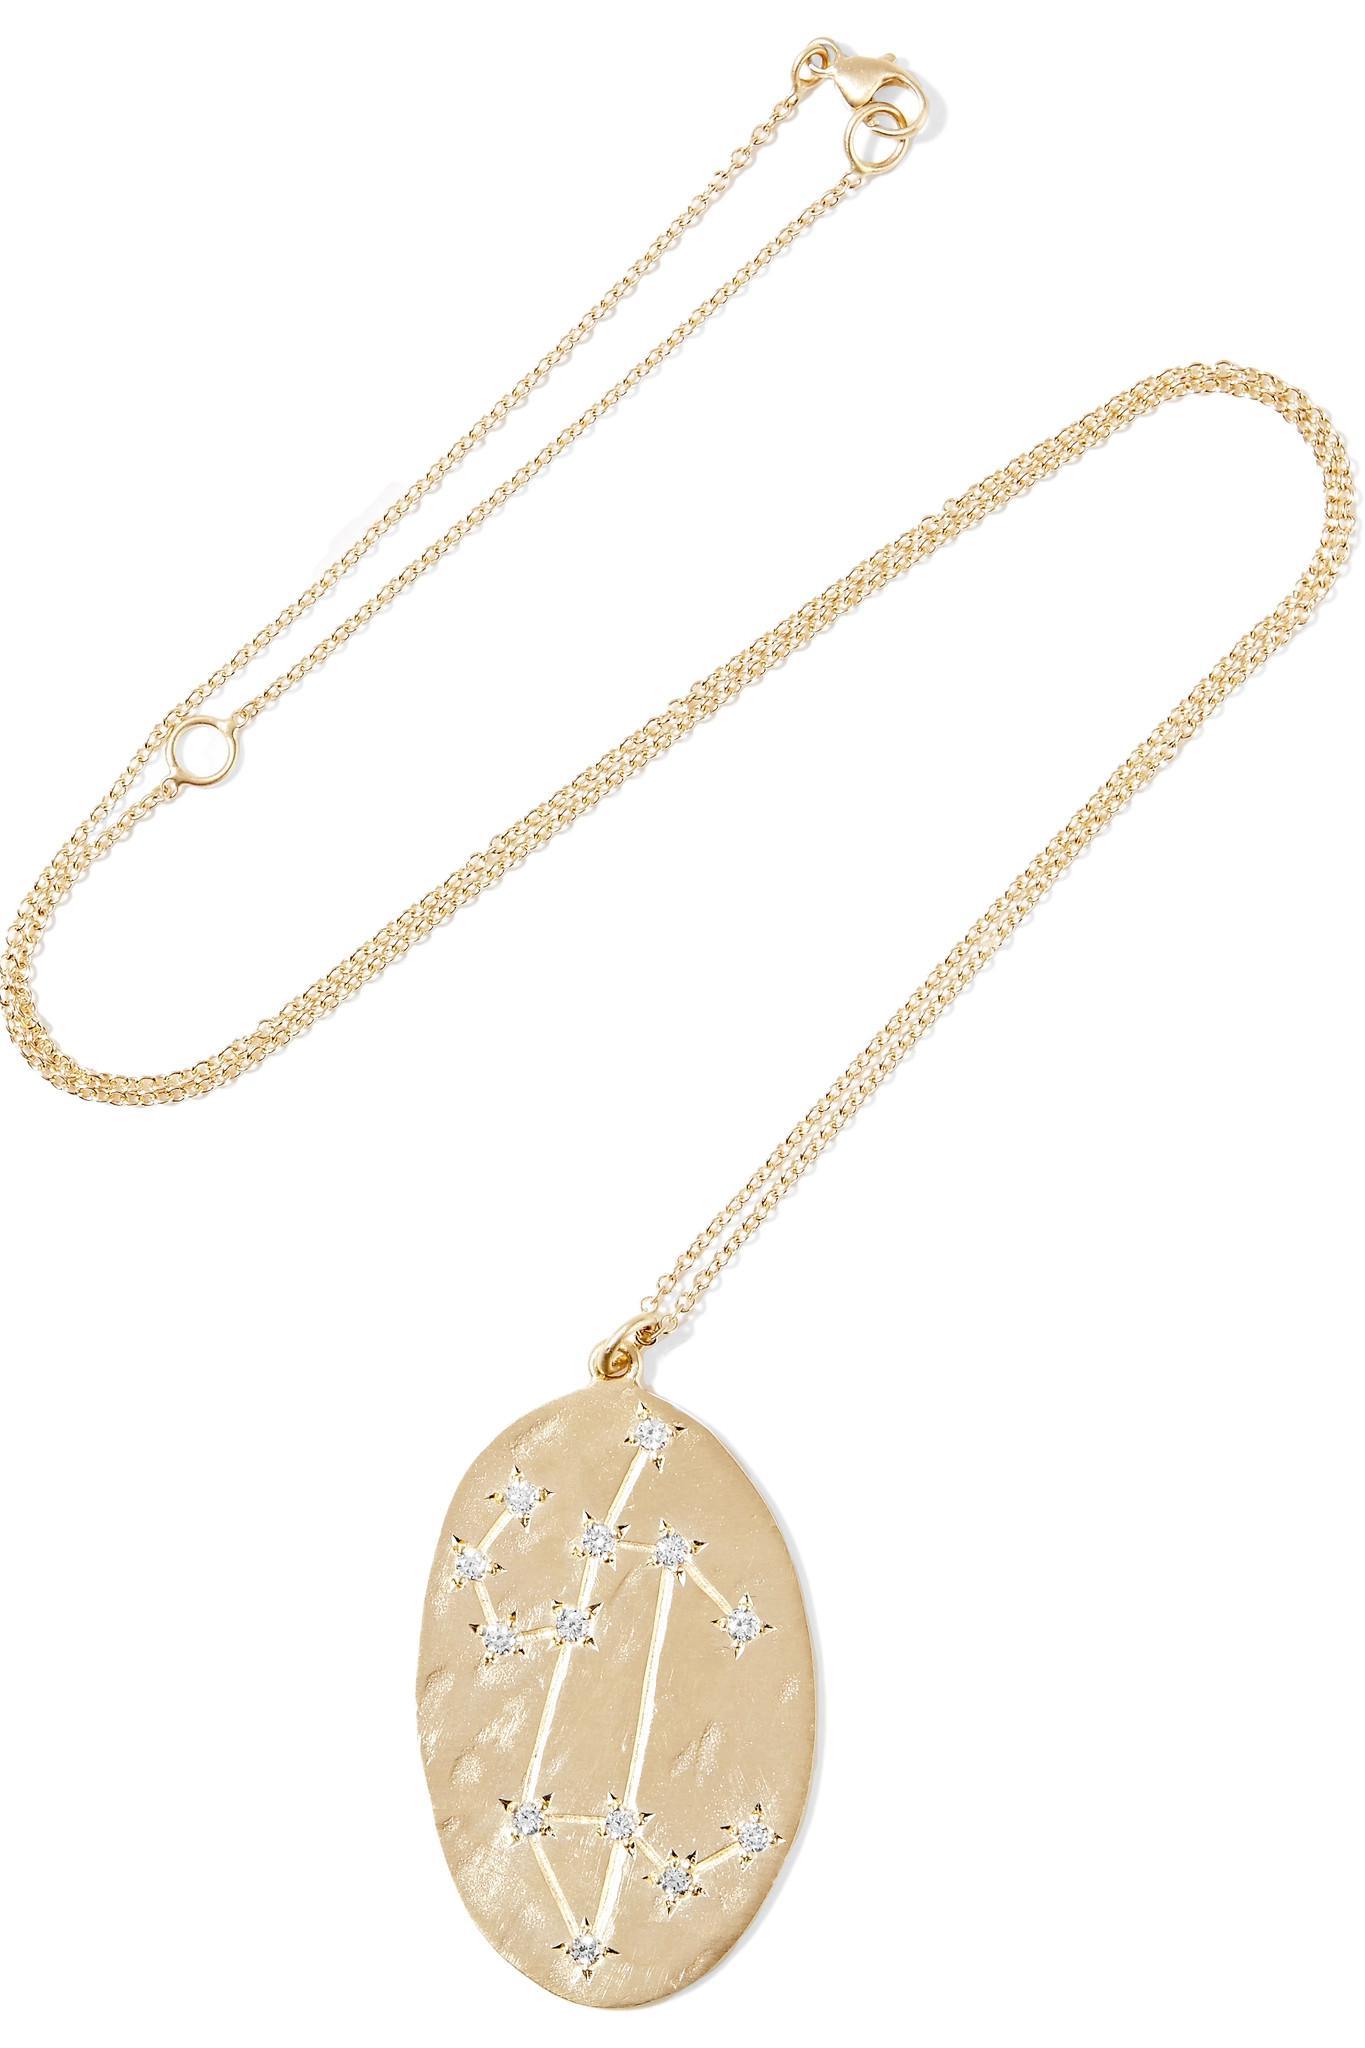 Brooke Gregson Aries 14-karat Gold Diamond Necklace ebu4XQno